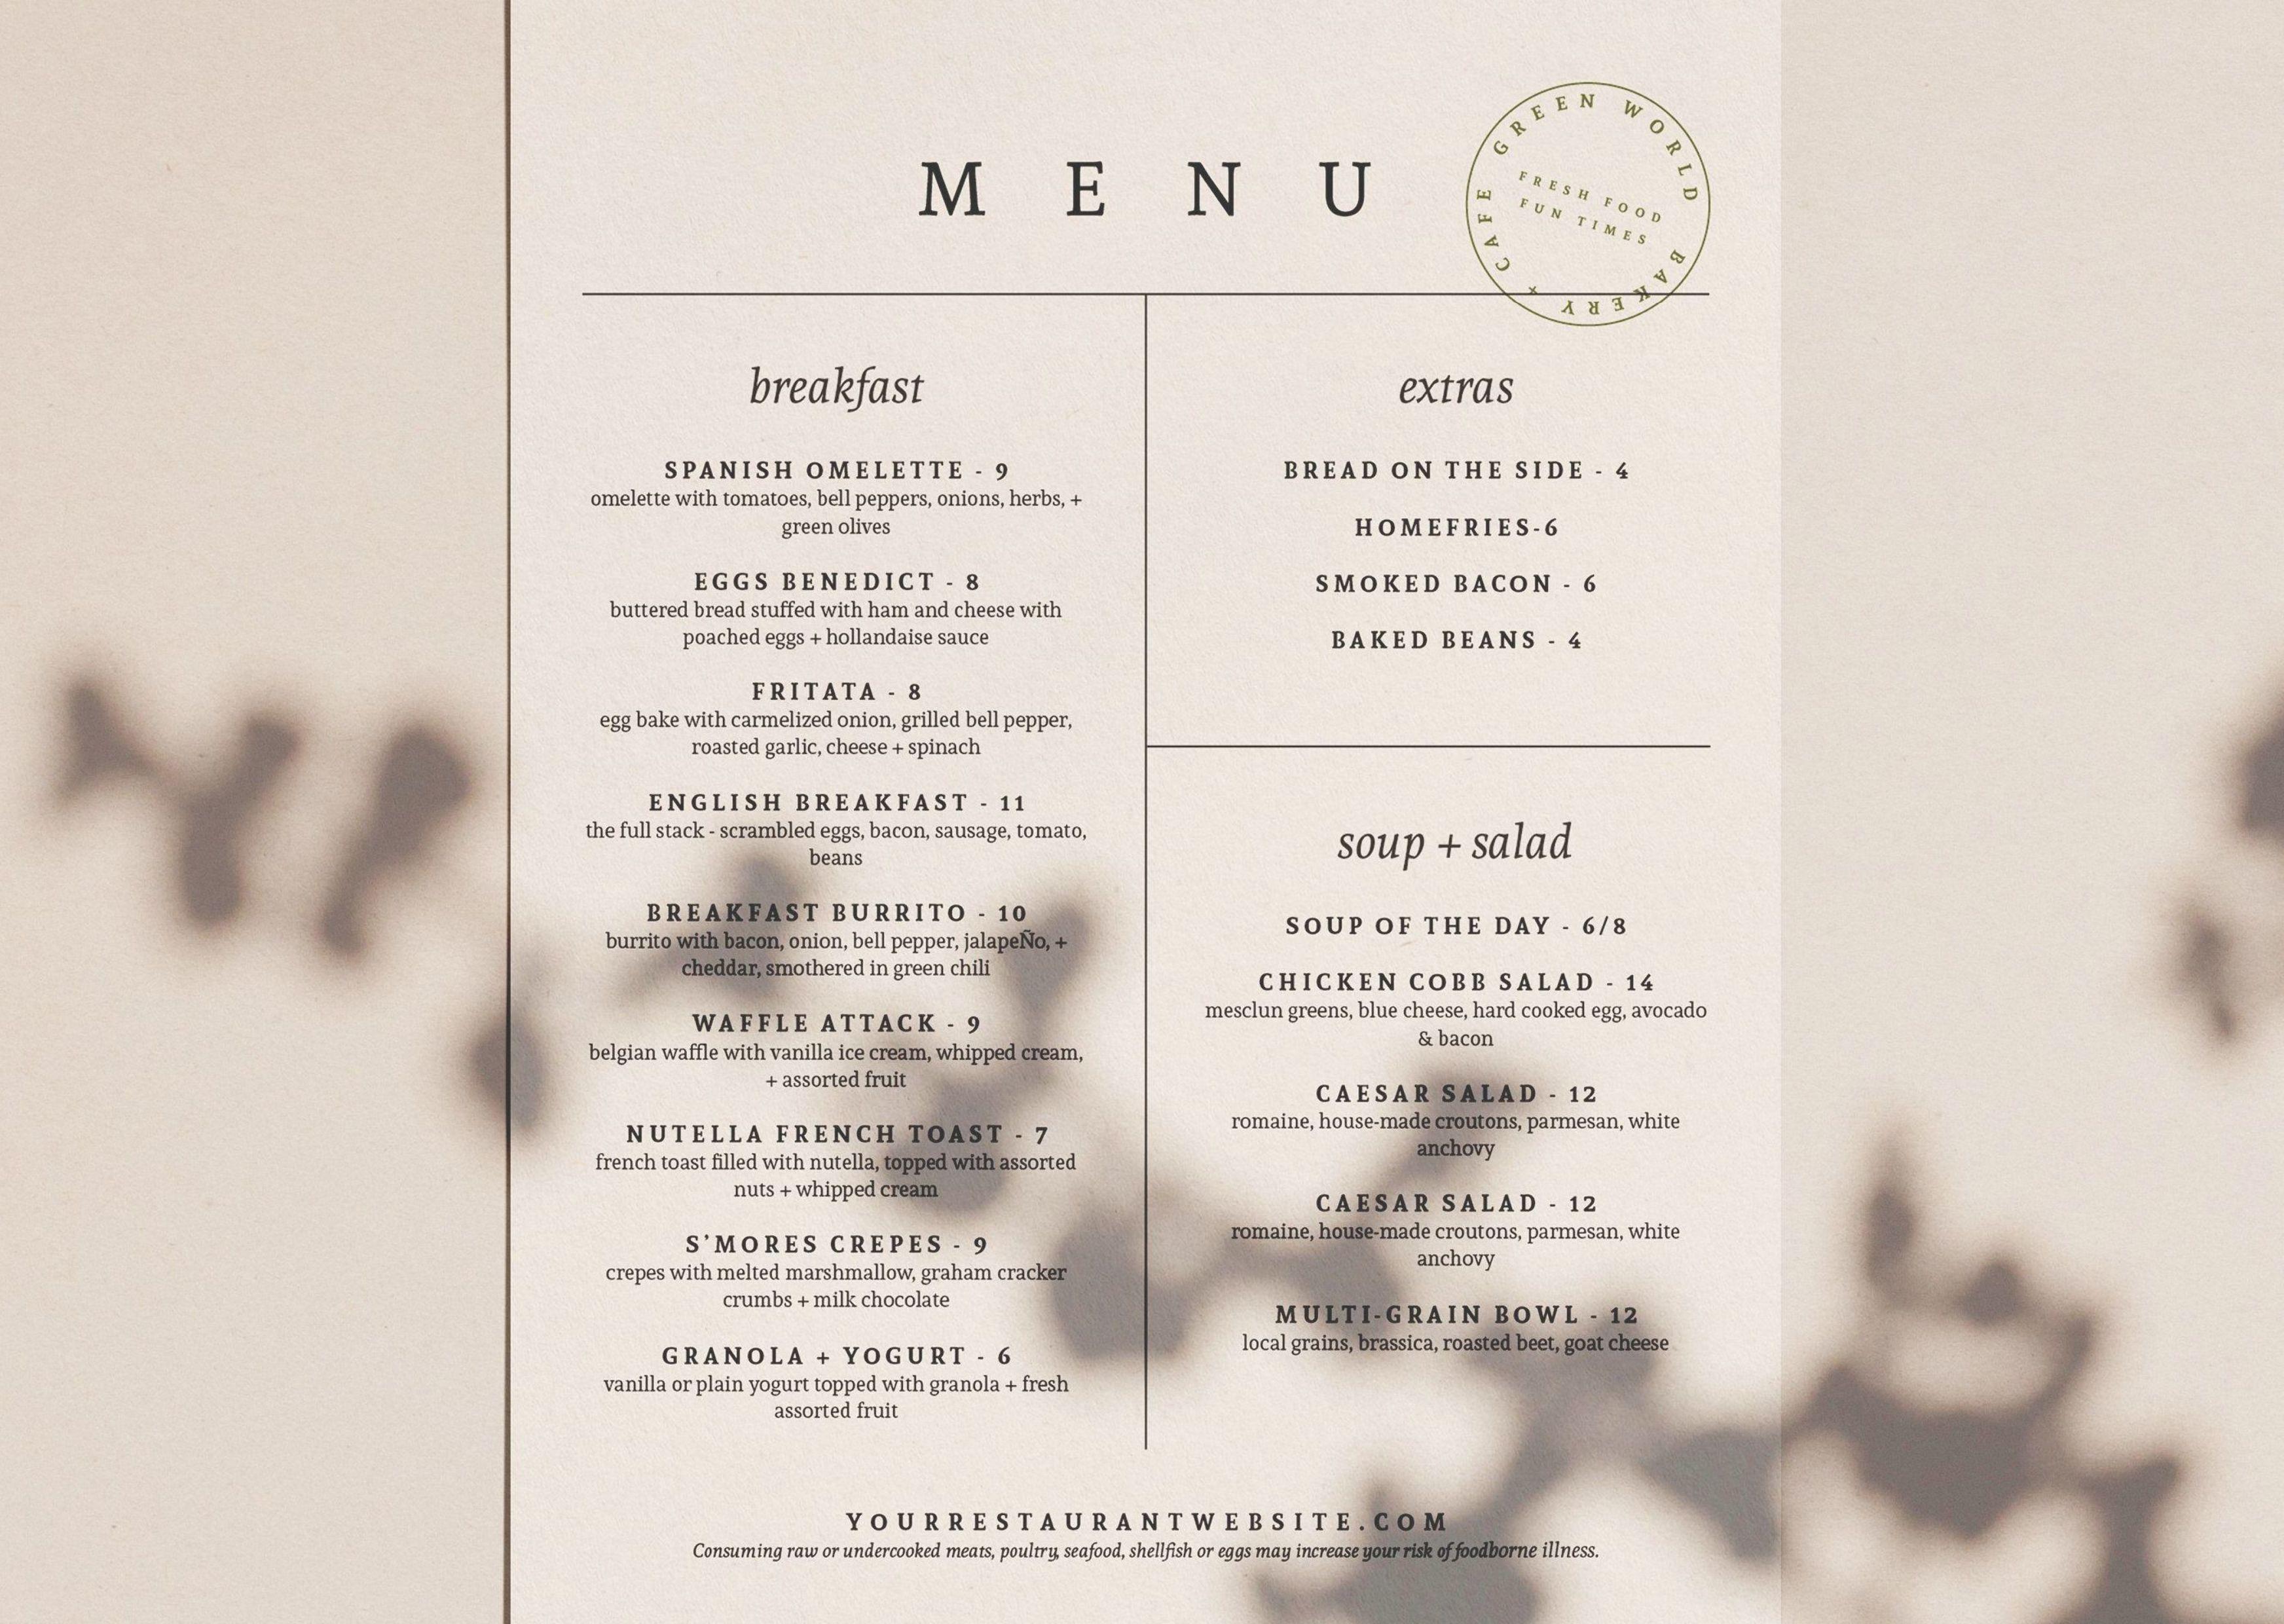 Restaurant Menu Design Minimal Cafe Menu Design Trendy Food Etsy Cafe Menu Design Menu Design Restaurant Menu Design